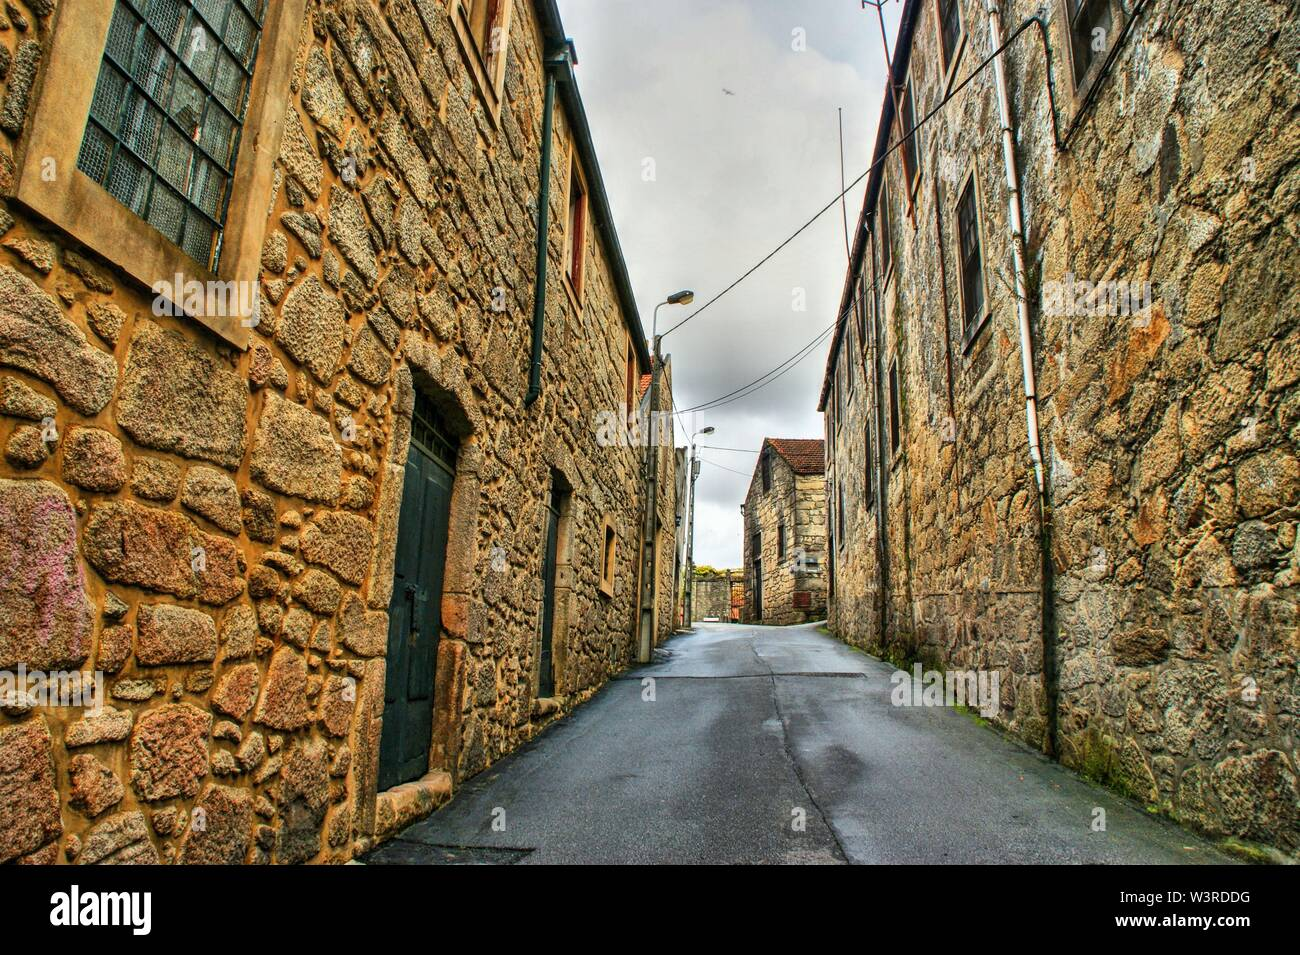 Port Wine Cellars streets in Vila Nova de Gaia, Portugal - Stock Image